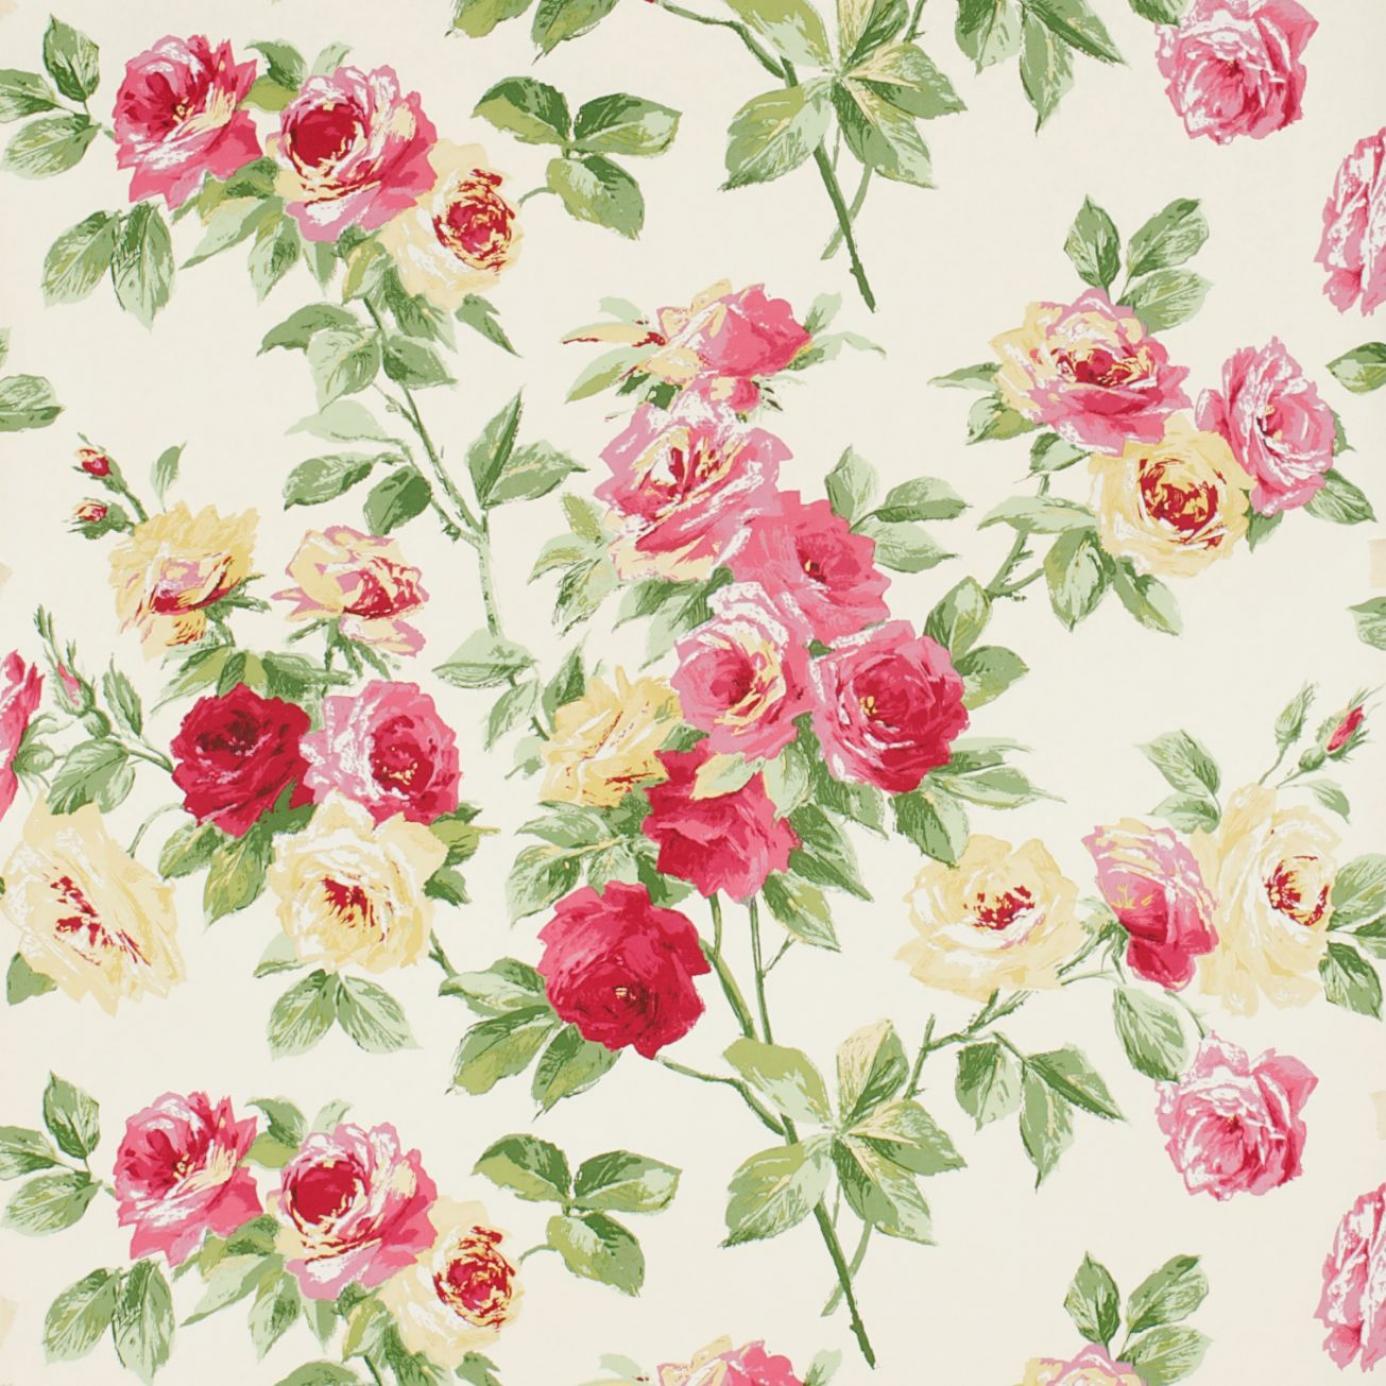 Free Download Wallpapers Sanderson Vintage Wallpapers